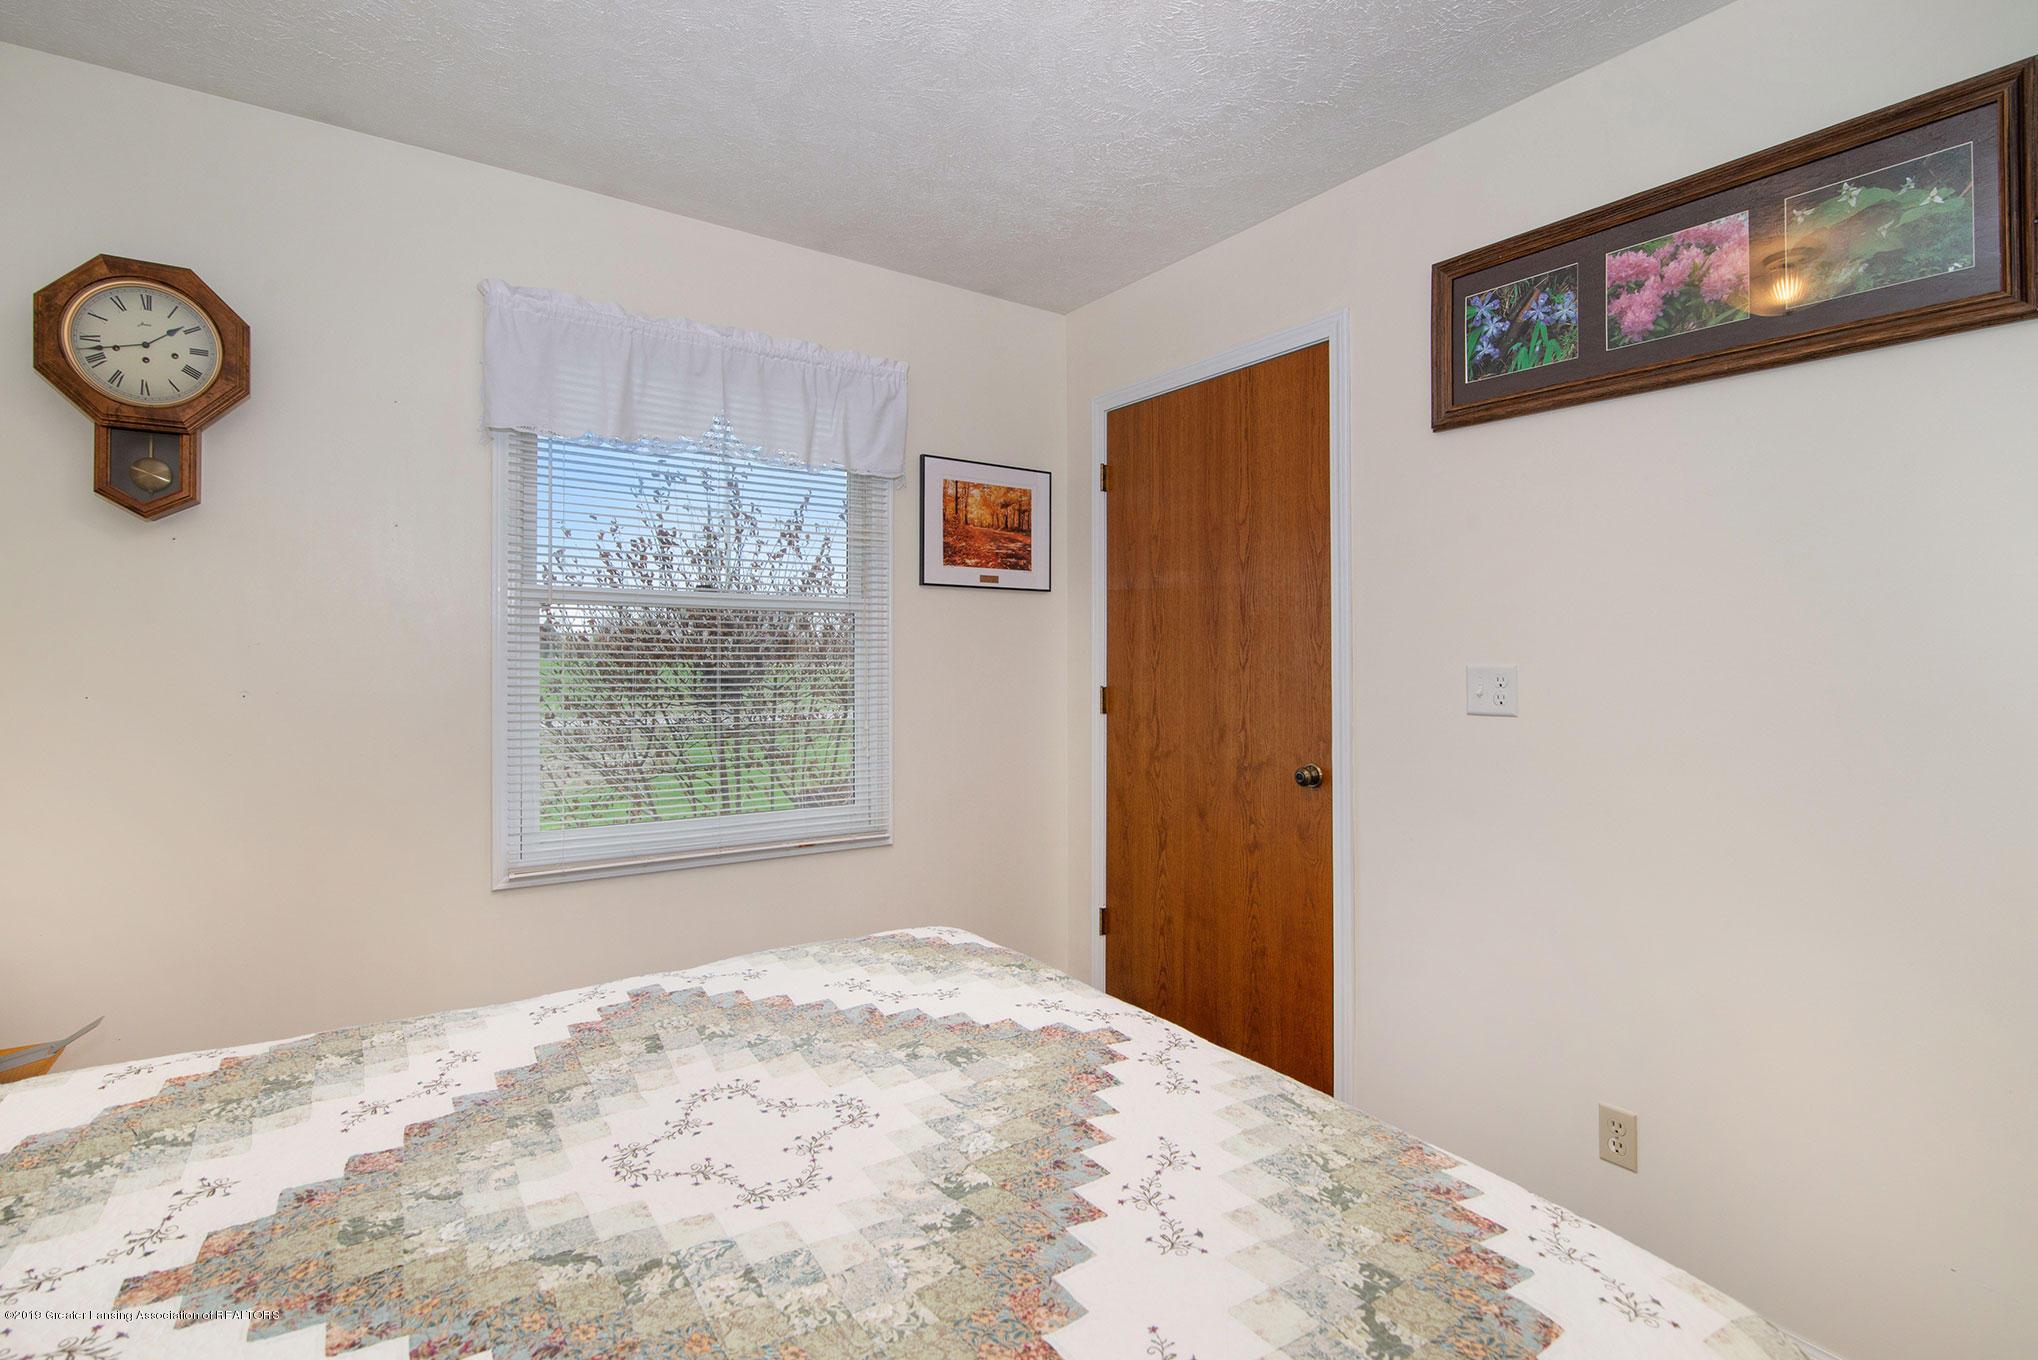 6043 N Watson Rd - Photo-Apr-29,-10-45-03-AM - 16